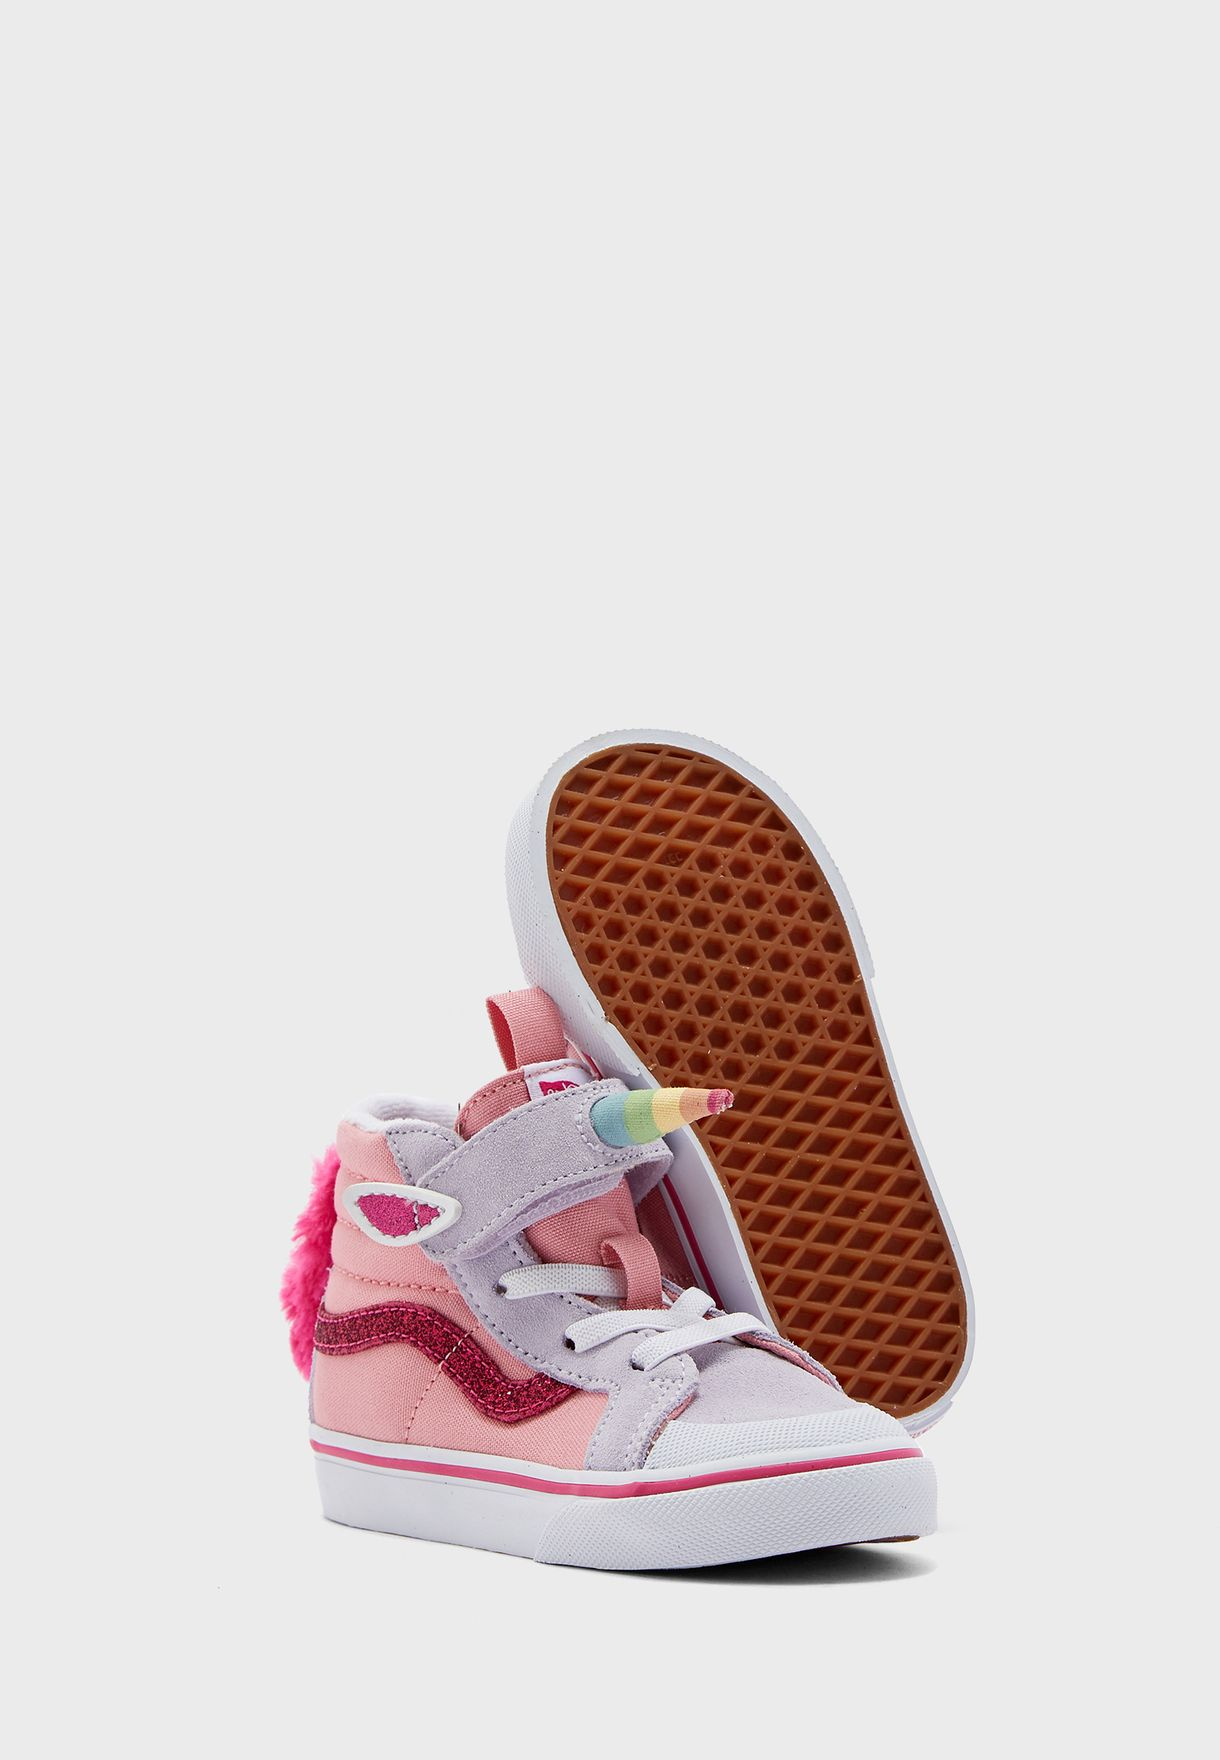 Buy Vans multicolor Infant Unicorn SK8